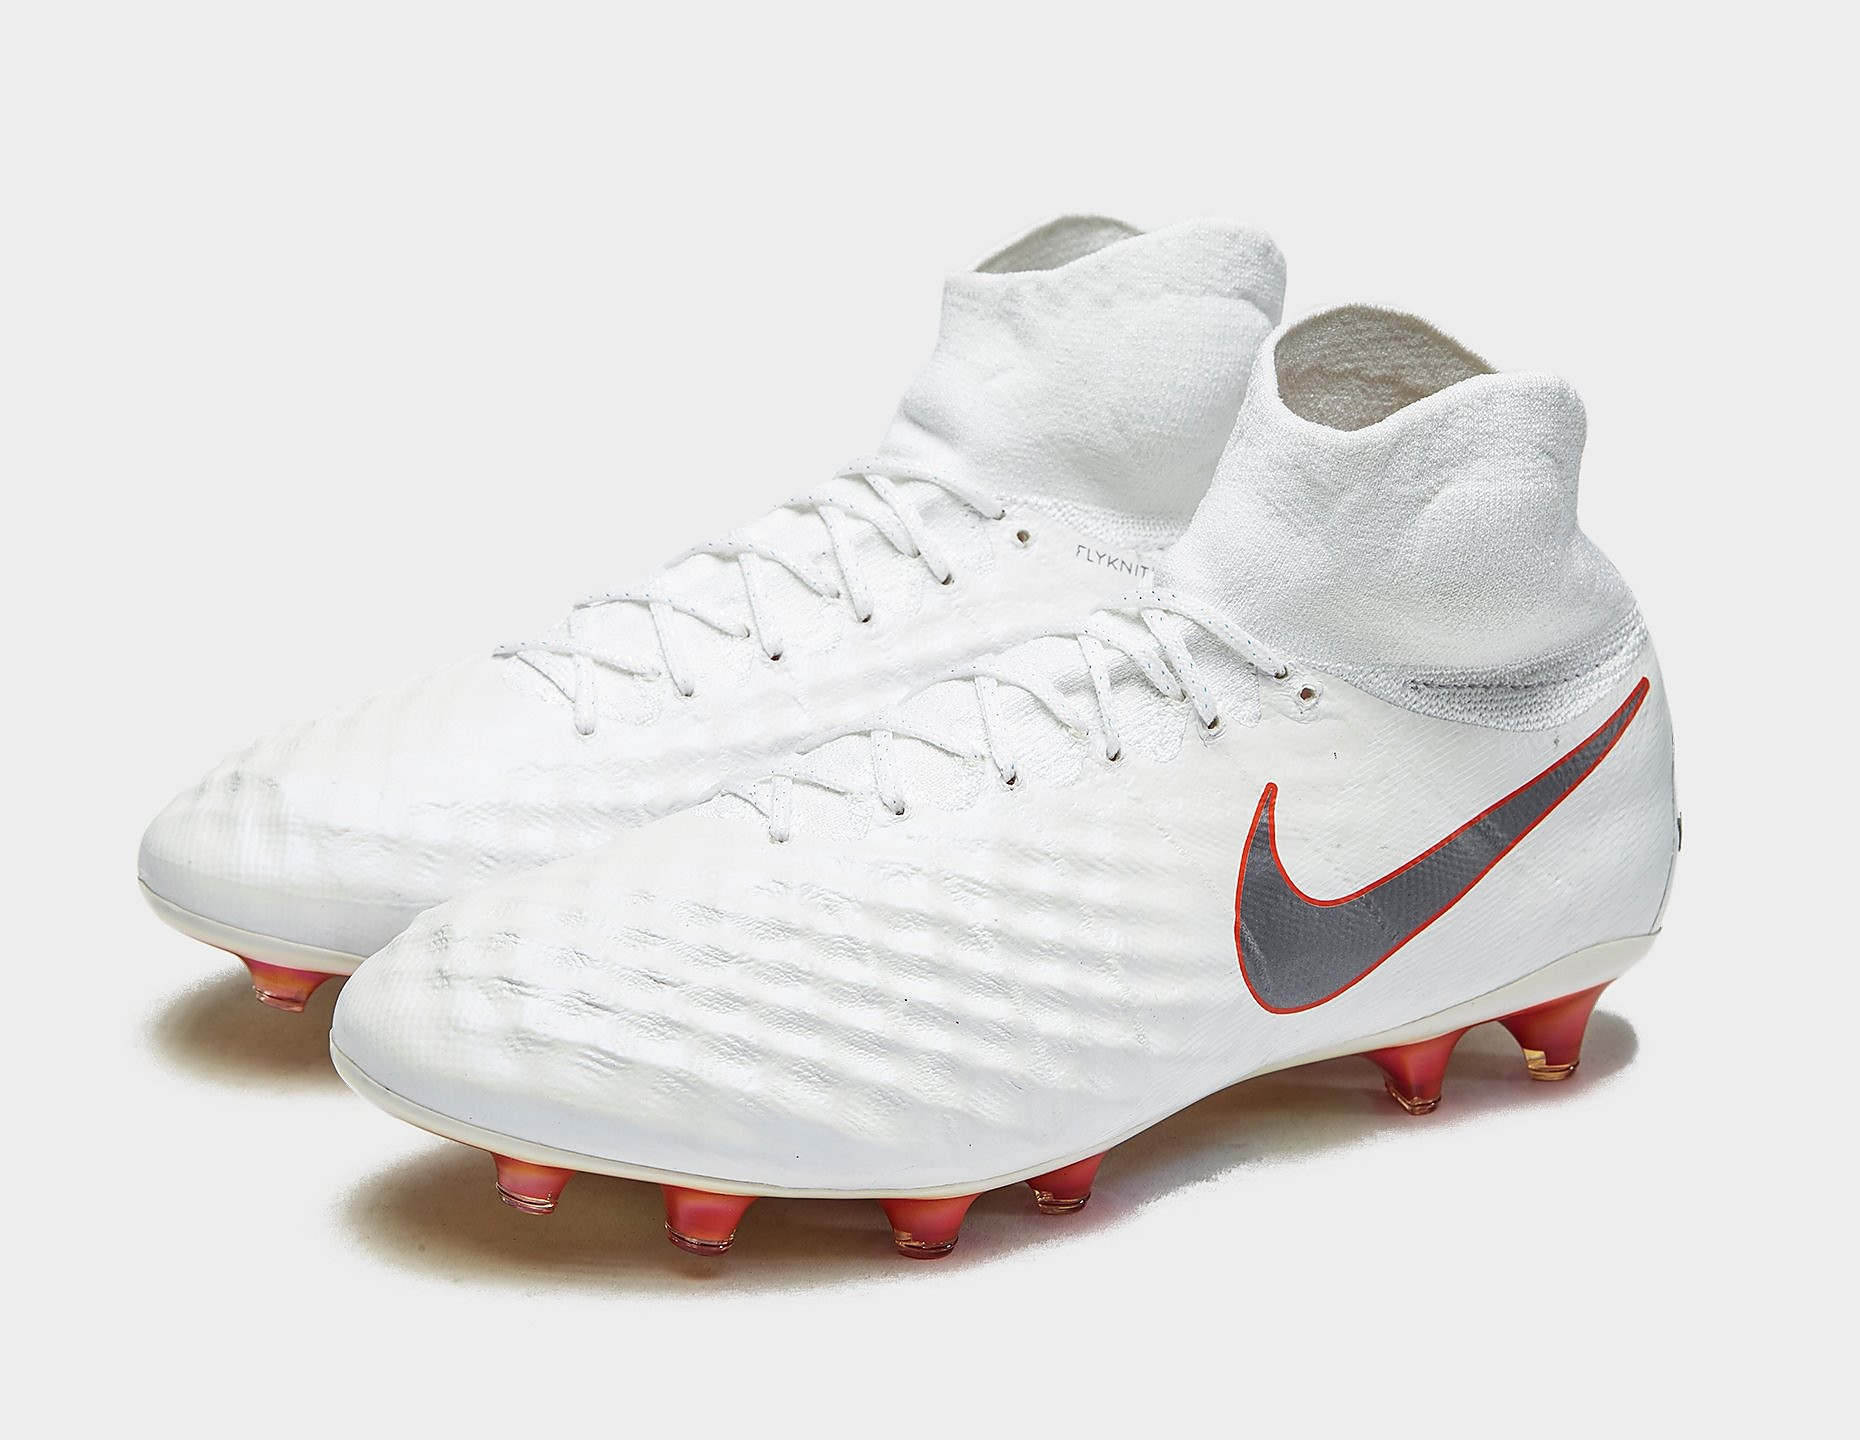 Nike Just Do It Magista Elite Dynamic Fit FG Heren